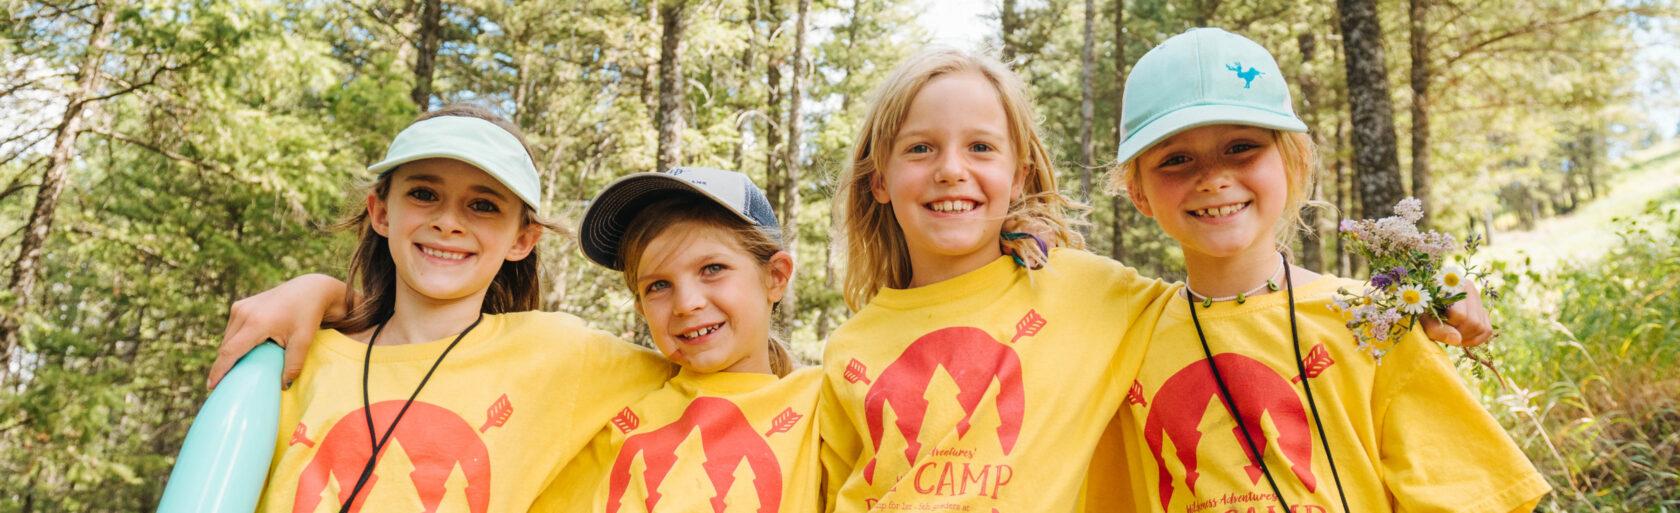 Jackson Hole Basecamp group photo